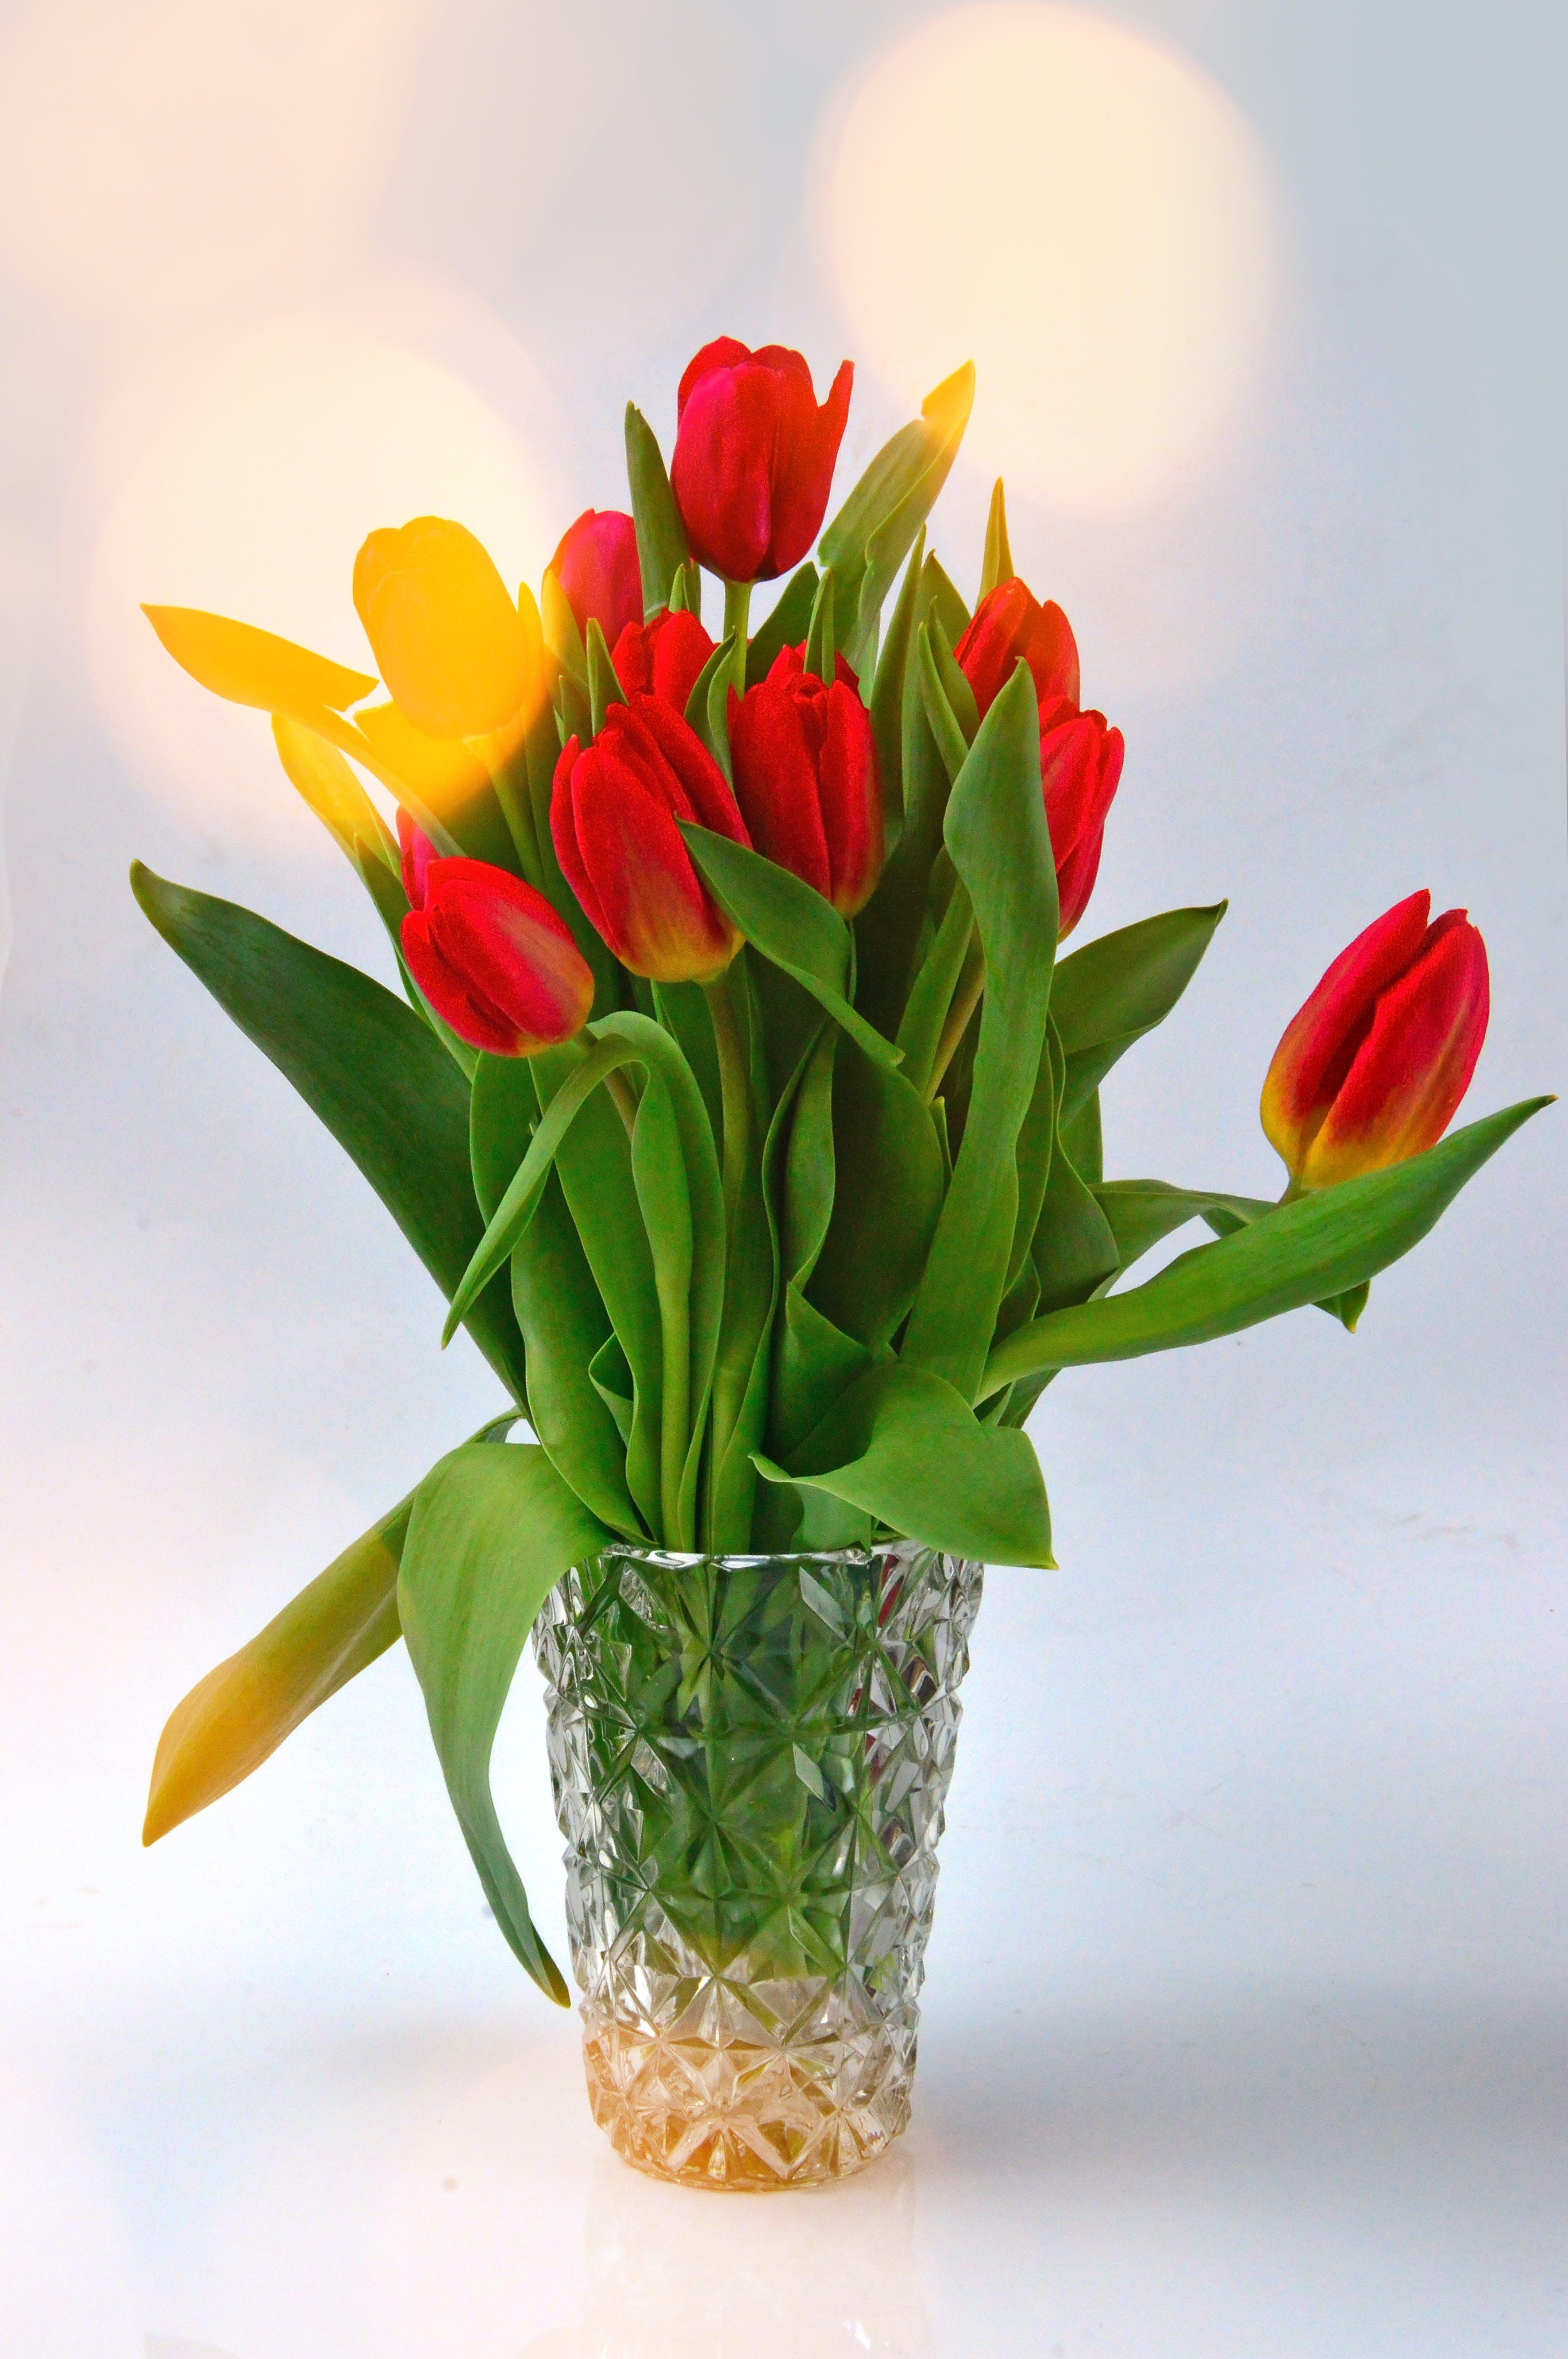 Free stock photo of background, beautiful, beauty, blossom